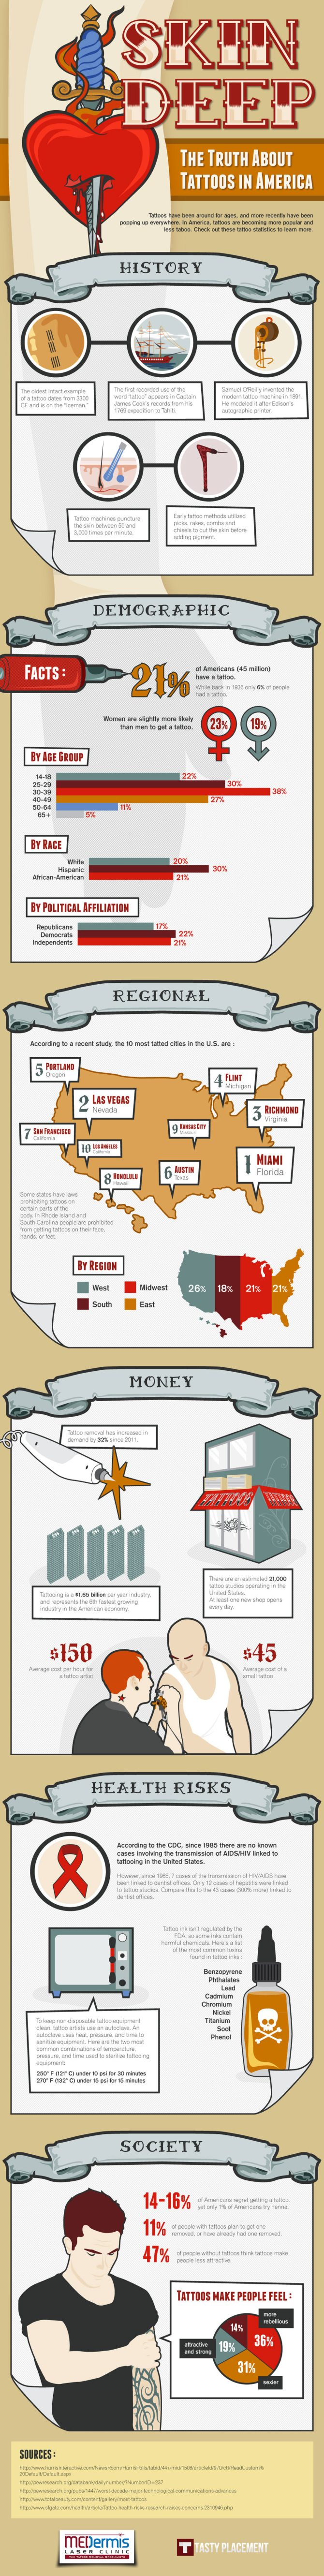 tattoo-infographic